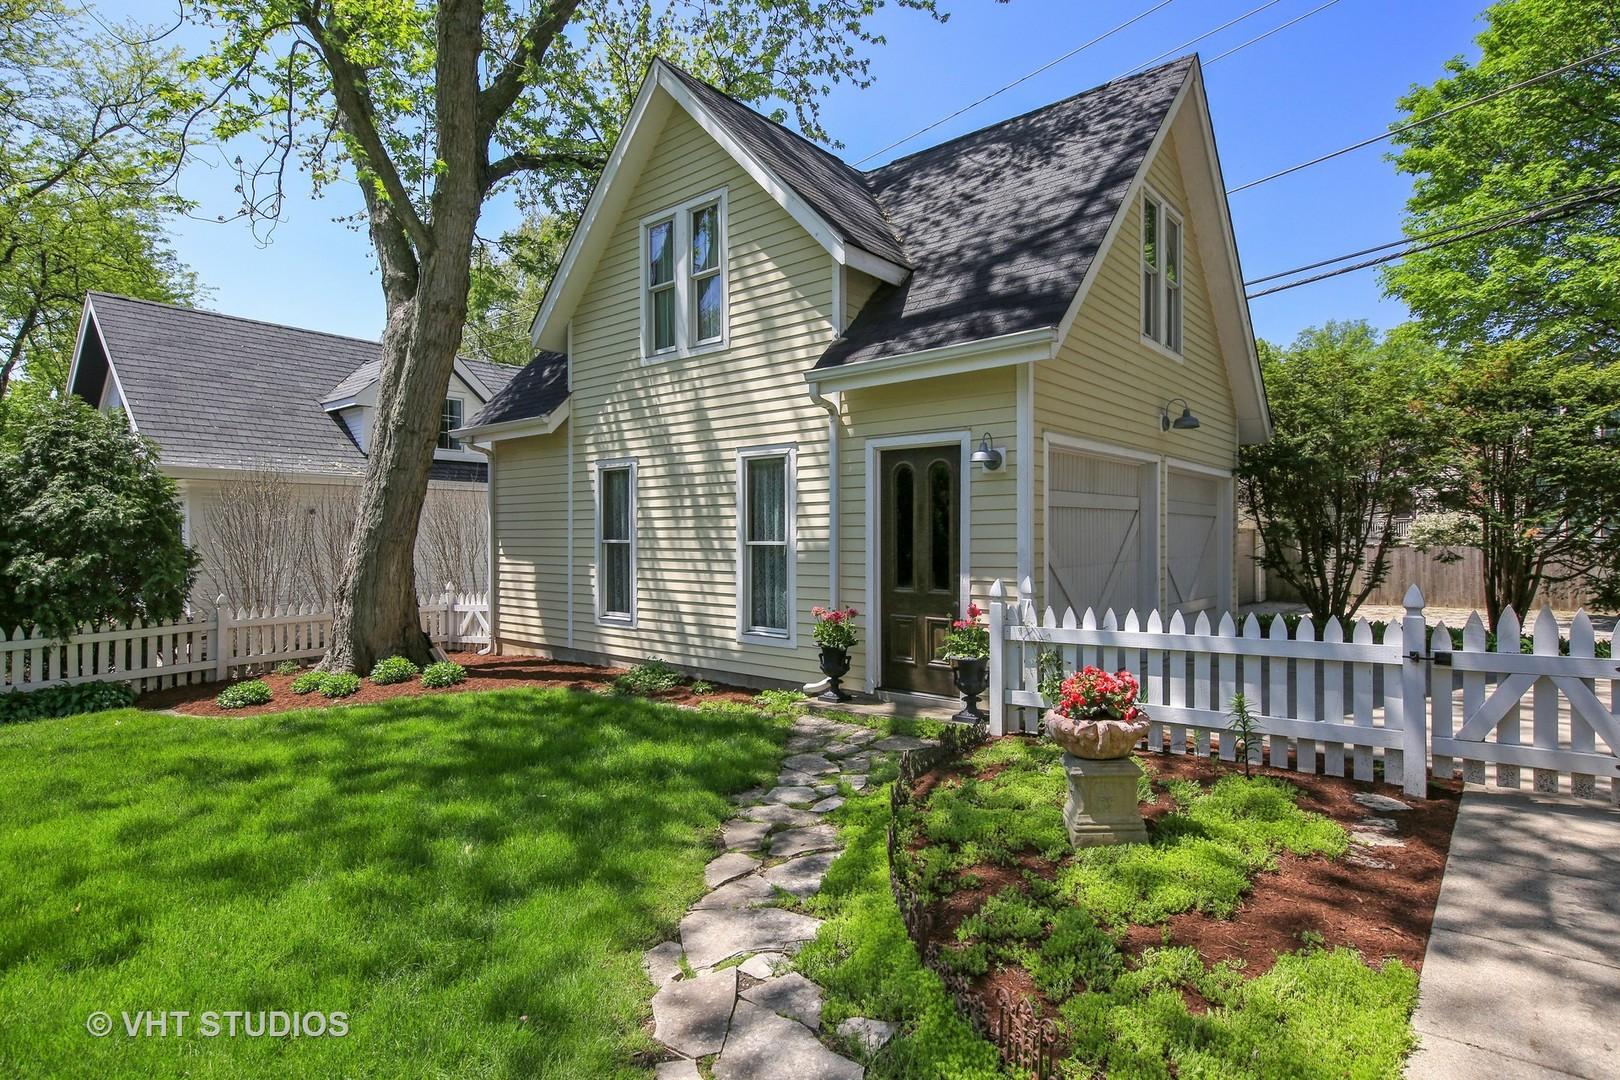 136 North WASHINGTON, Hinsdale, Illinois, 60521